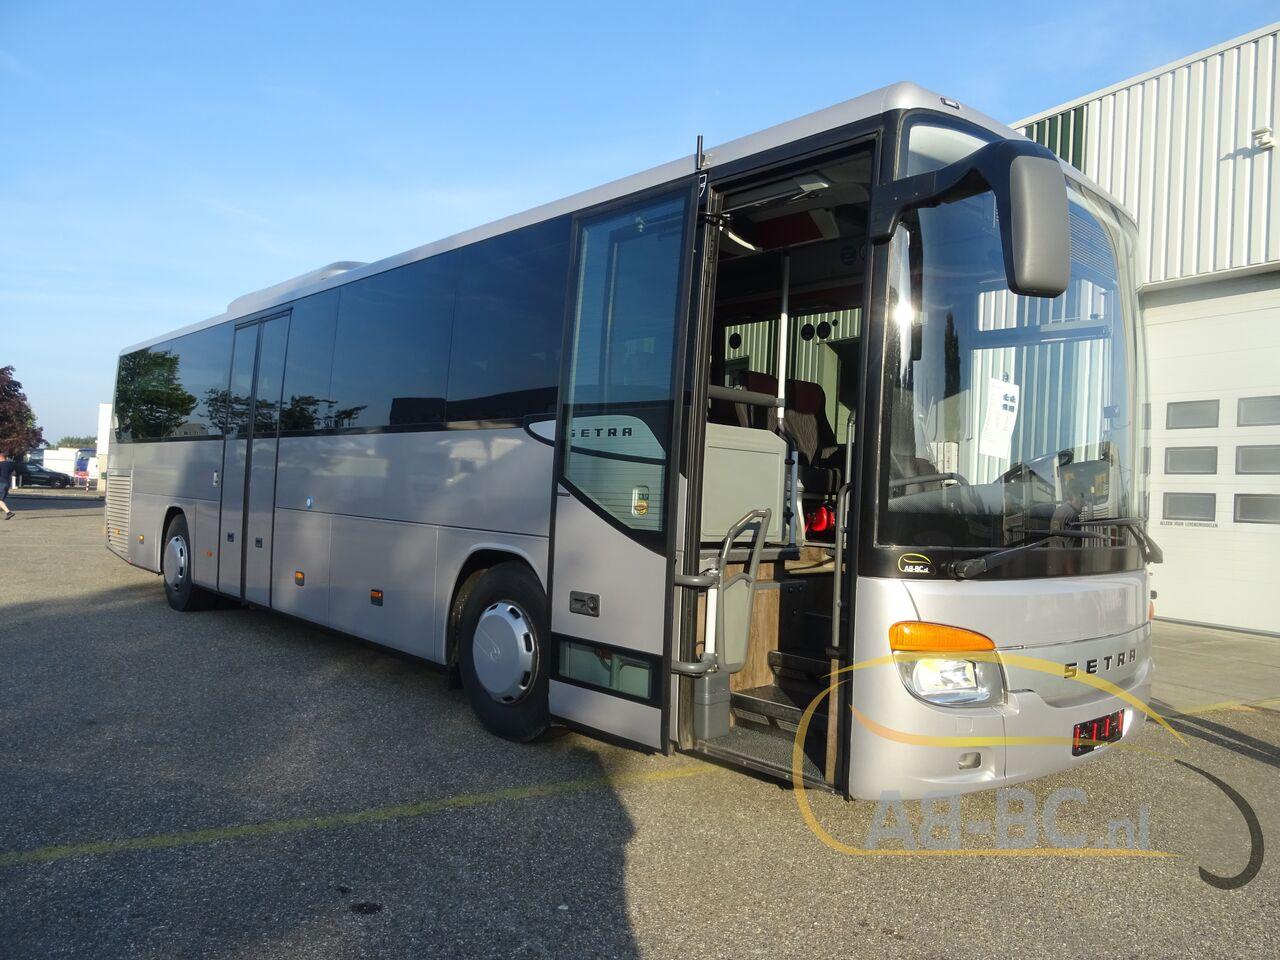 coach-bus-SETRA-S415H-52-Seats-EURO-6-Liftbus---1630913160620307551_big_61a45593a1789a29bbc7891ba29e1e7b--21070517141280735500